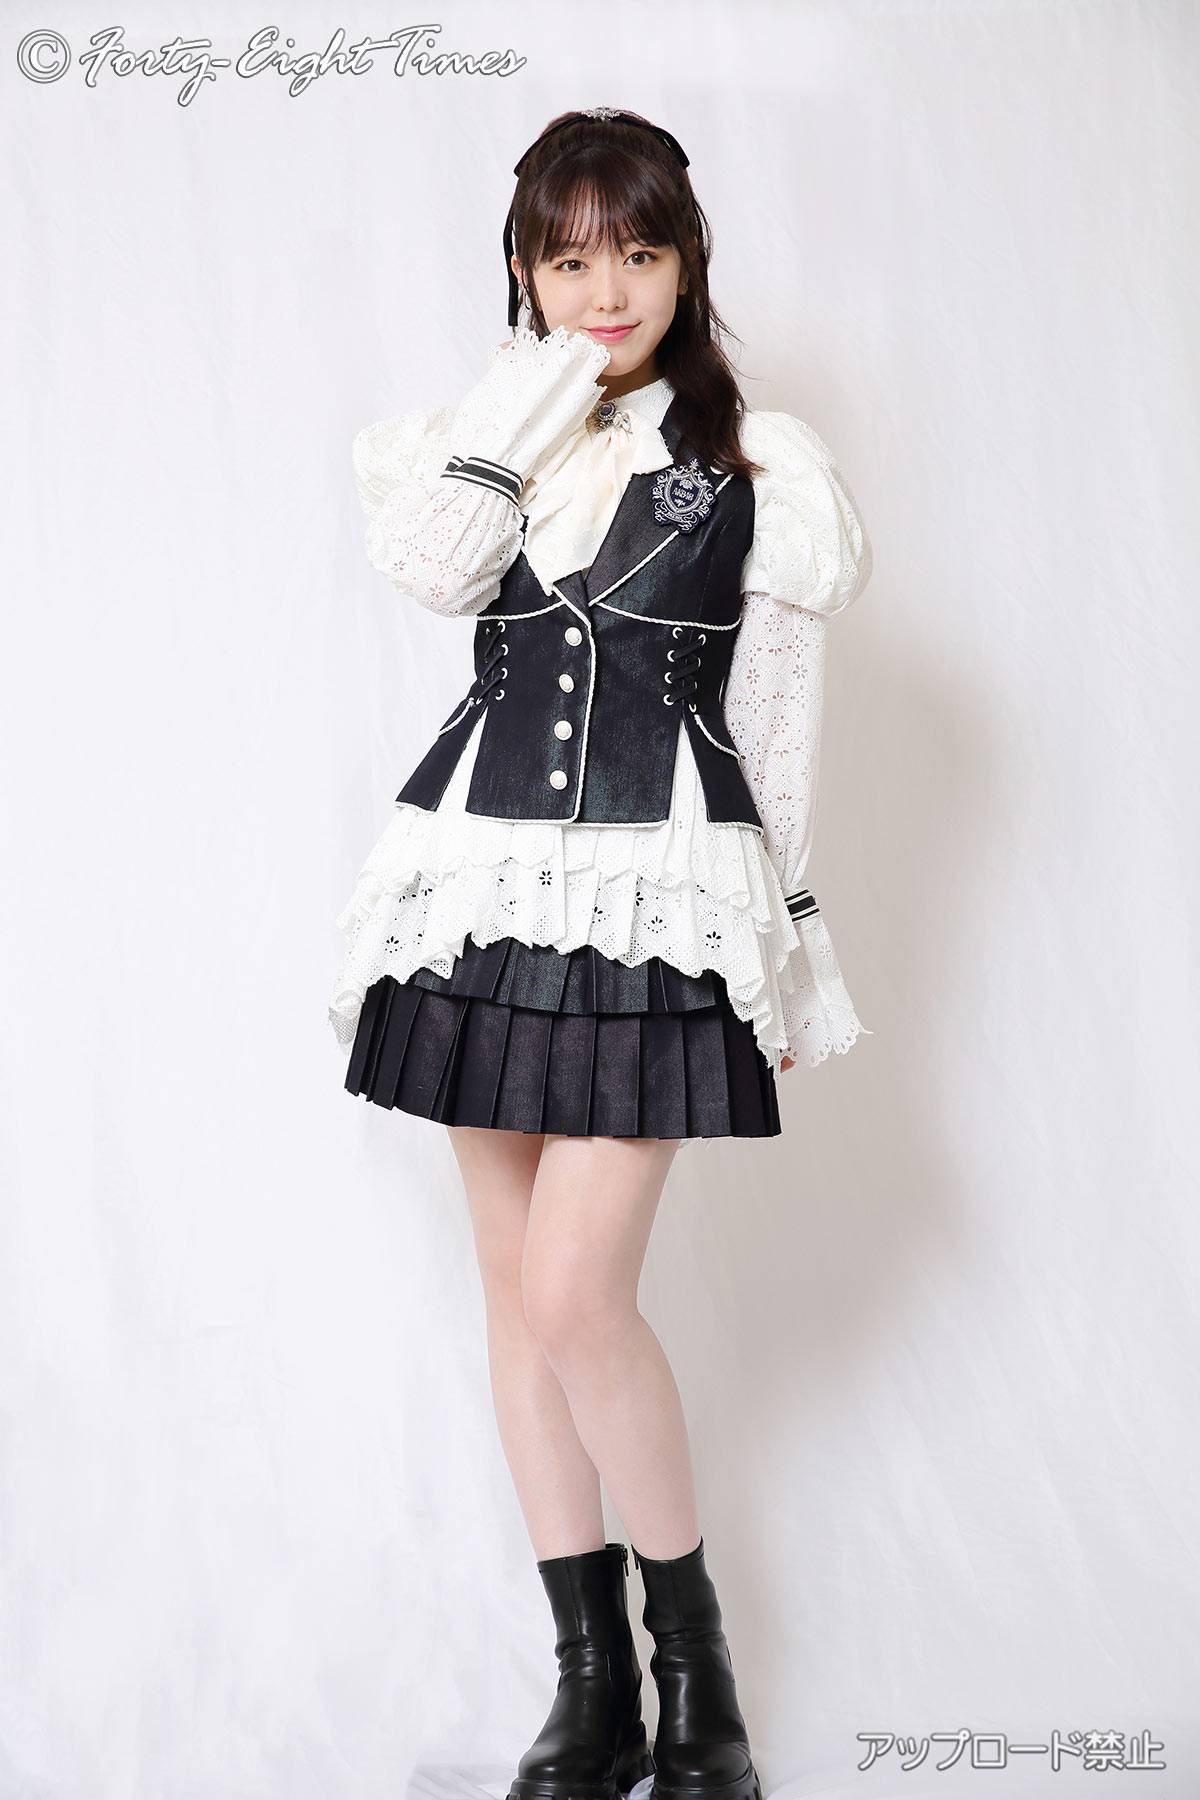 Minegishi Minami 48 Times 2105 06.jpg